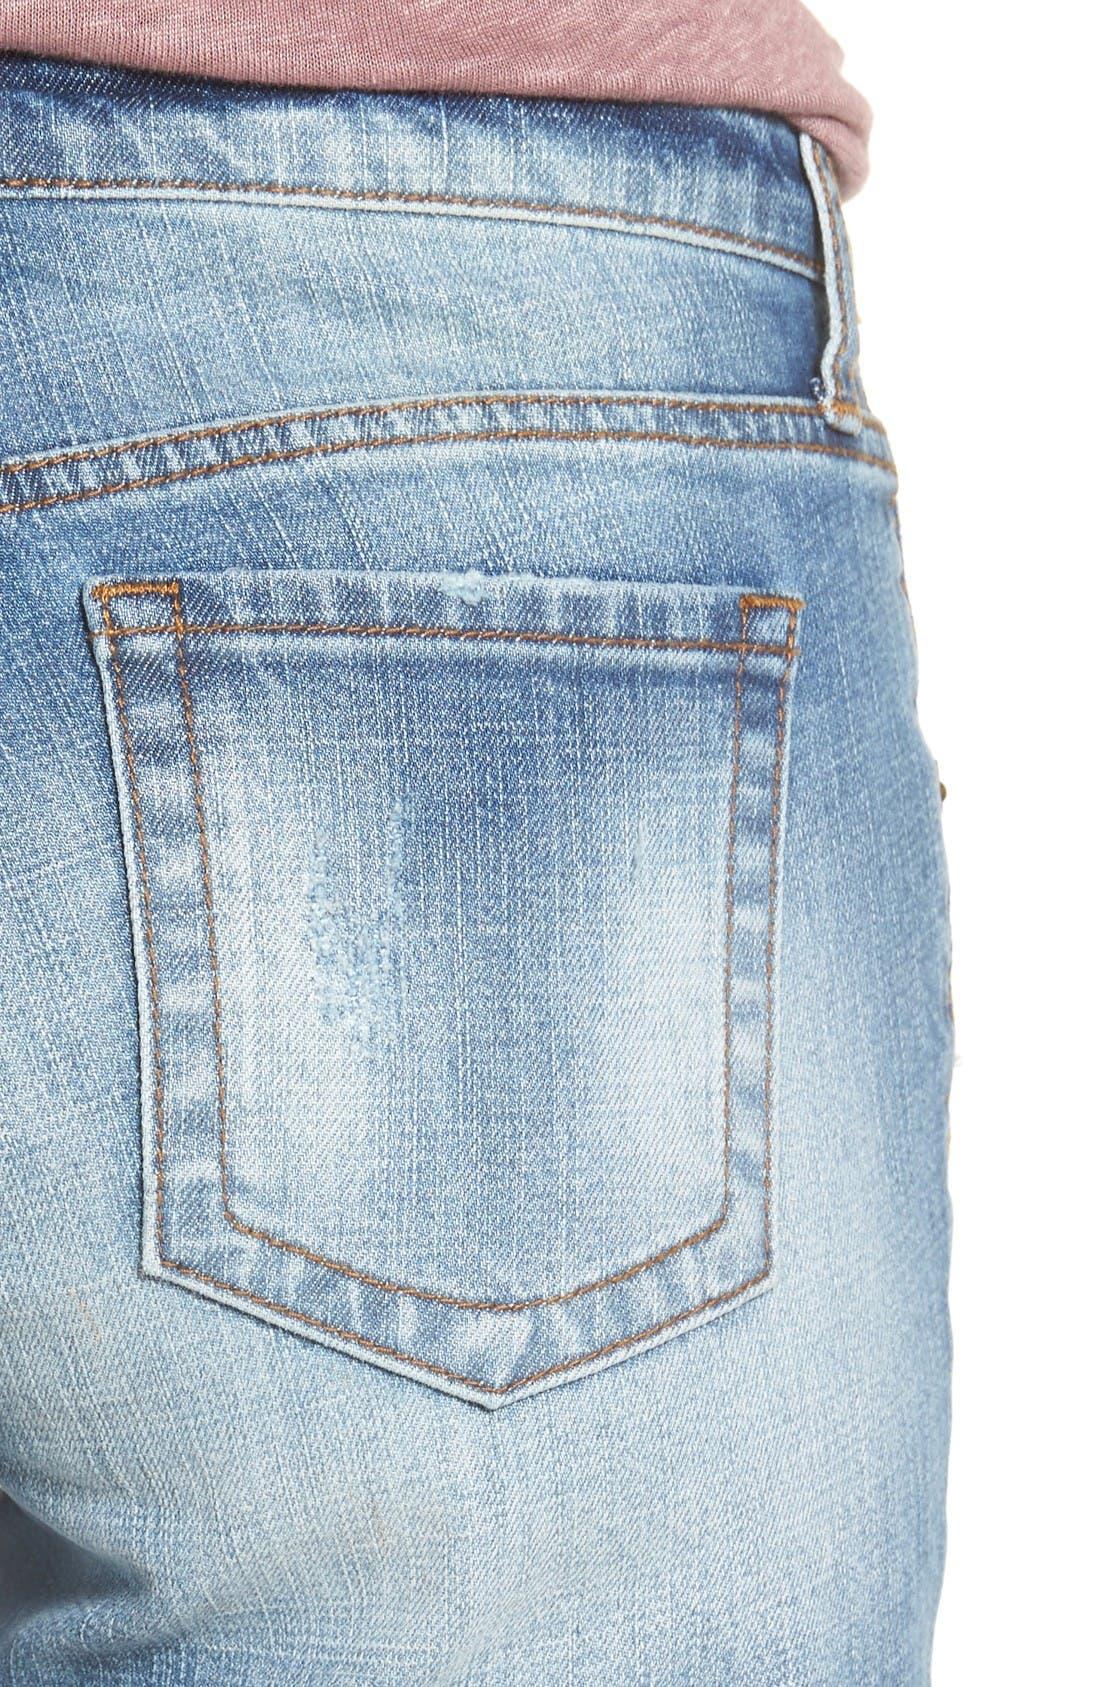 Alternate Image 4  - KUT from the Kloth Gidget Frayed Hem Denim Shorts